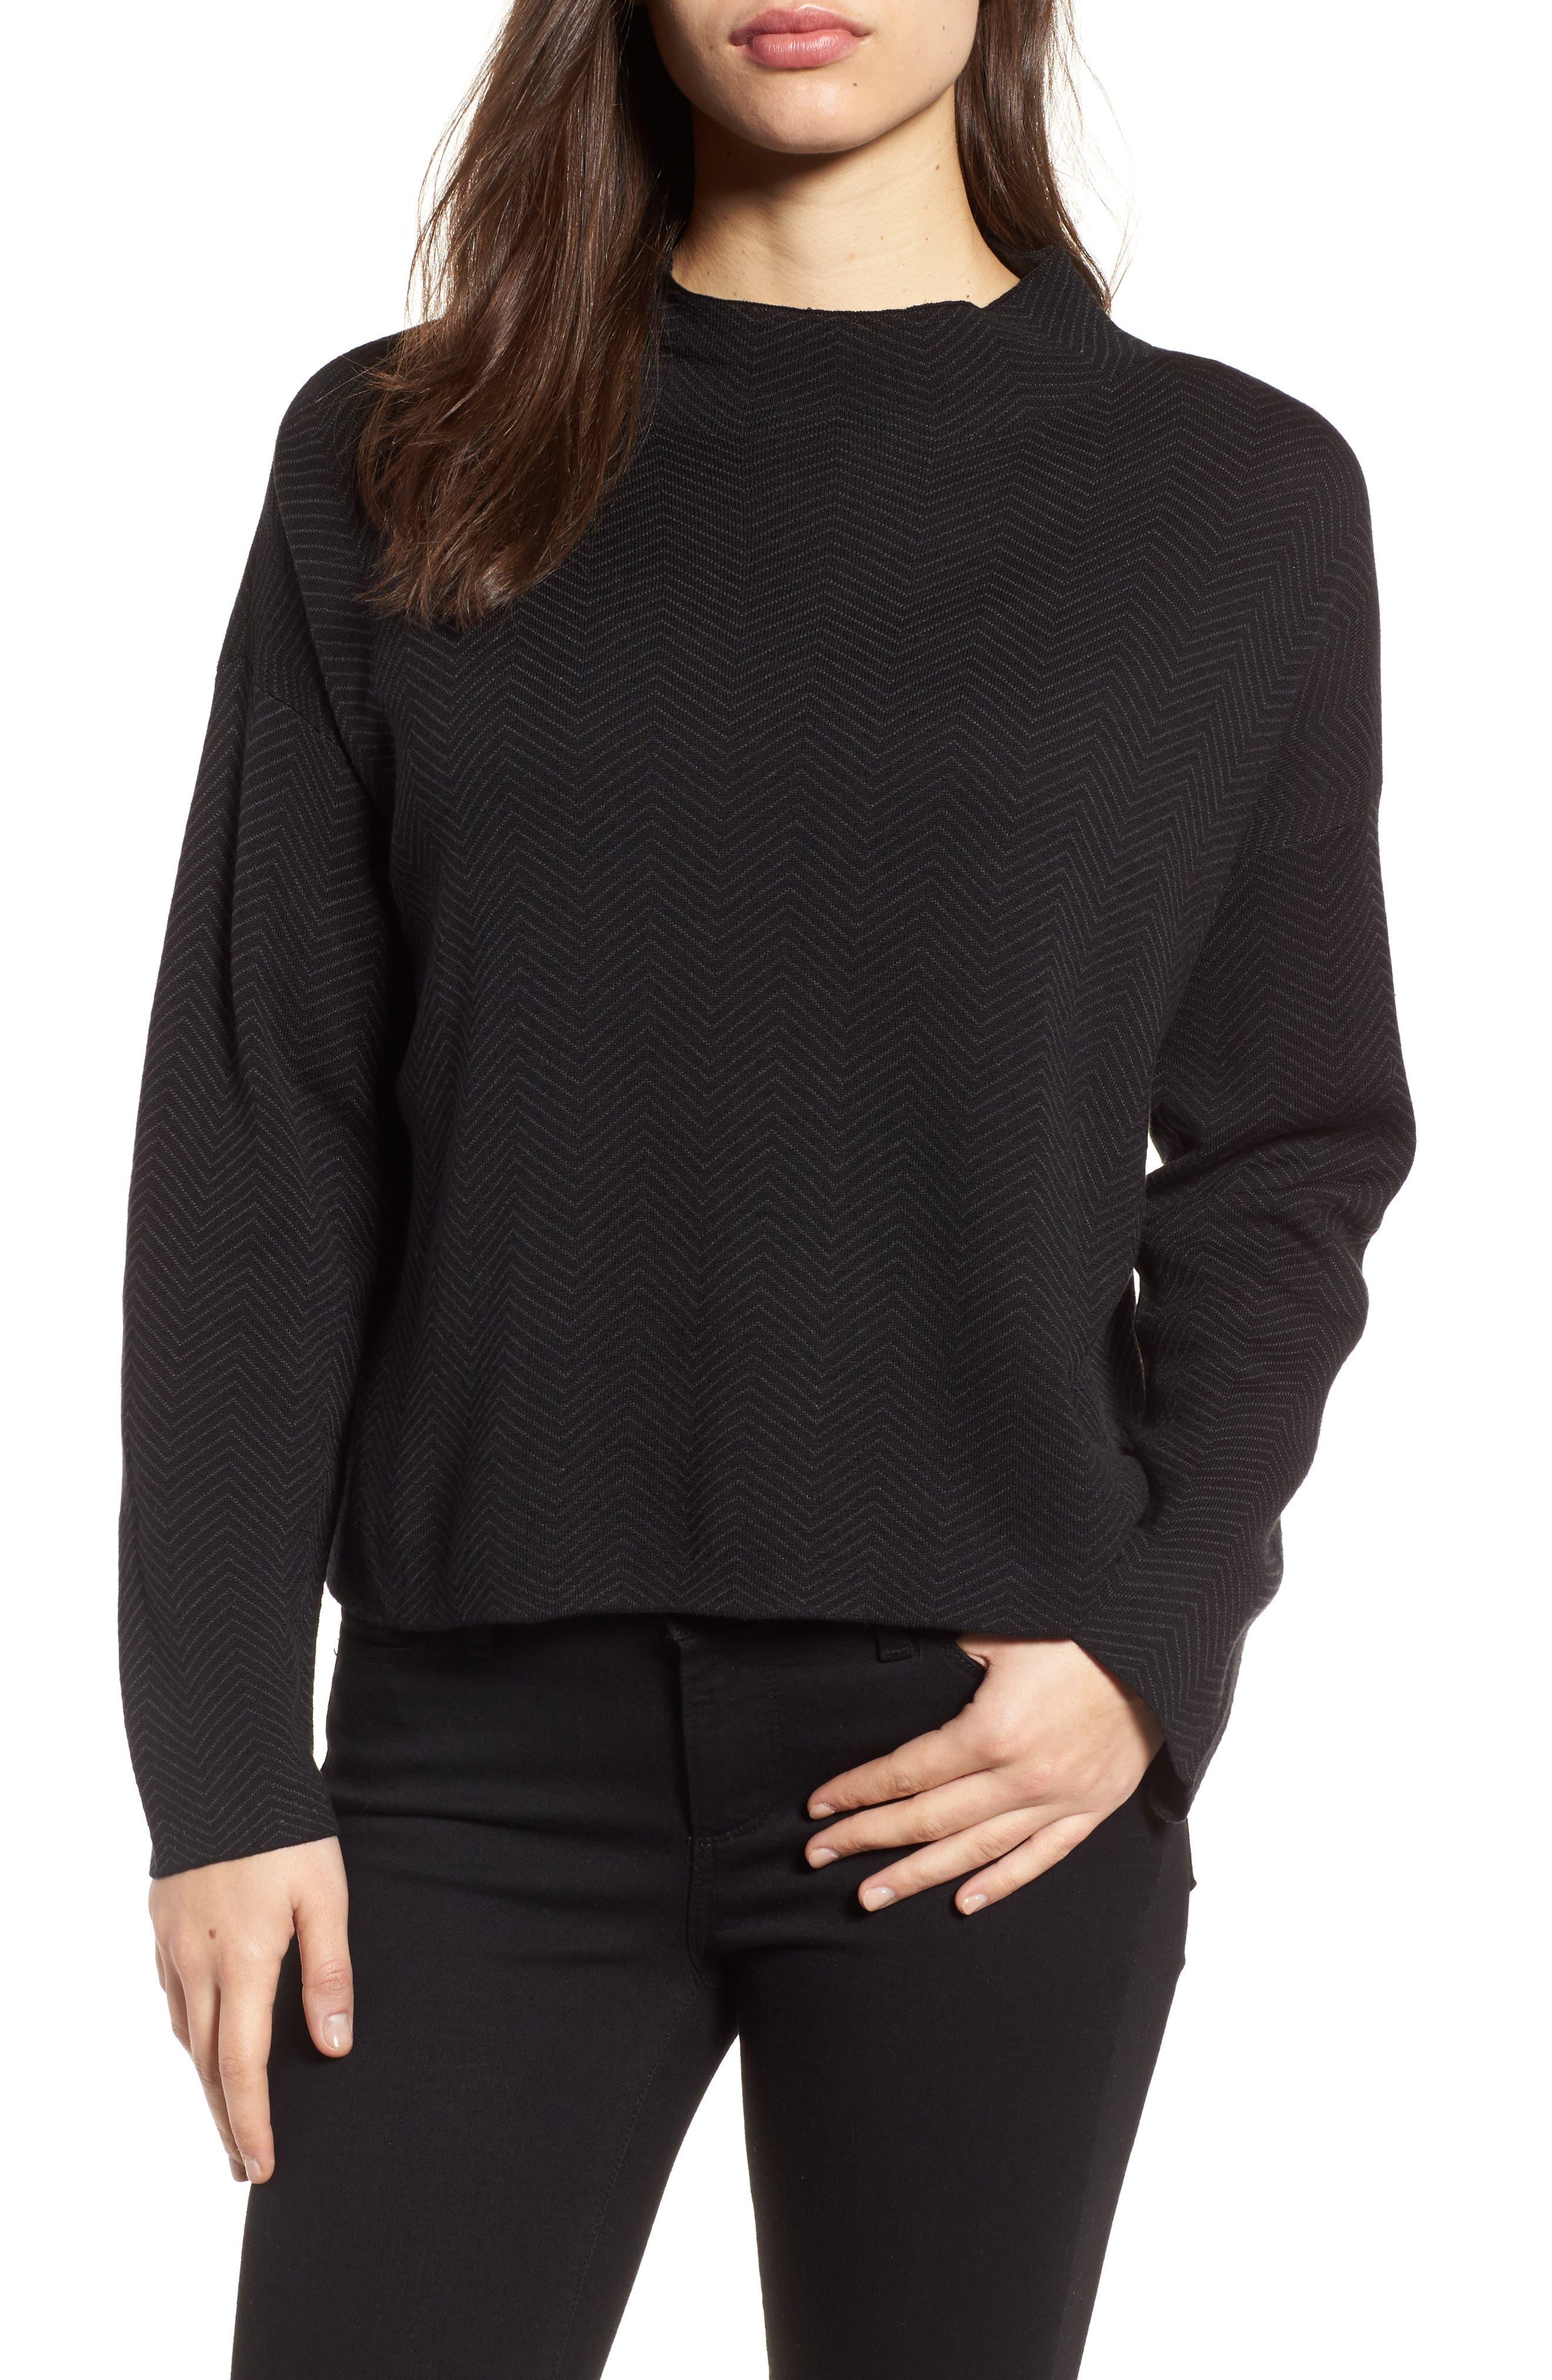 Main Image - Eileen Fisher Silk & Organic Cotton Jacquard Top